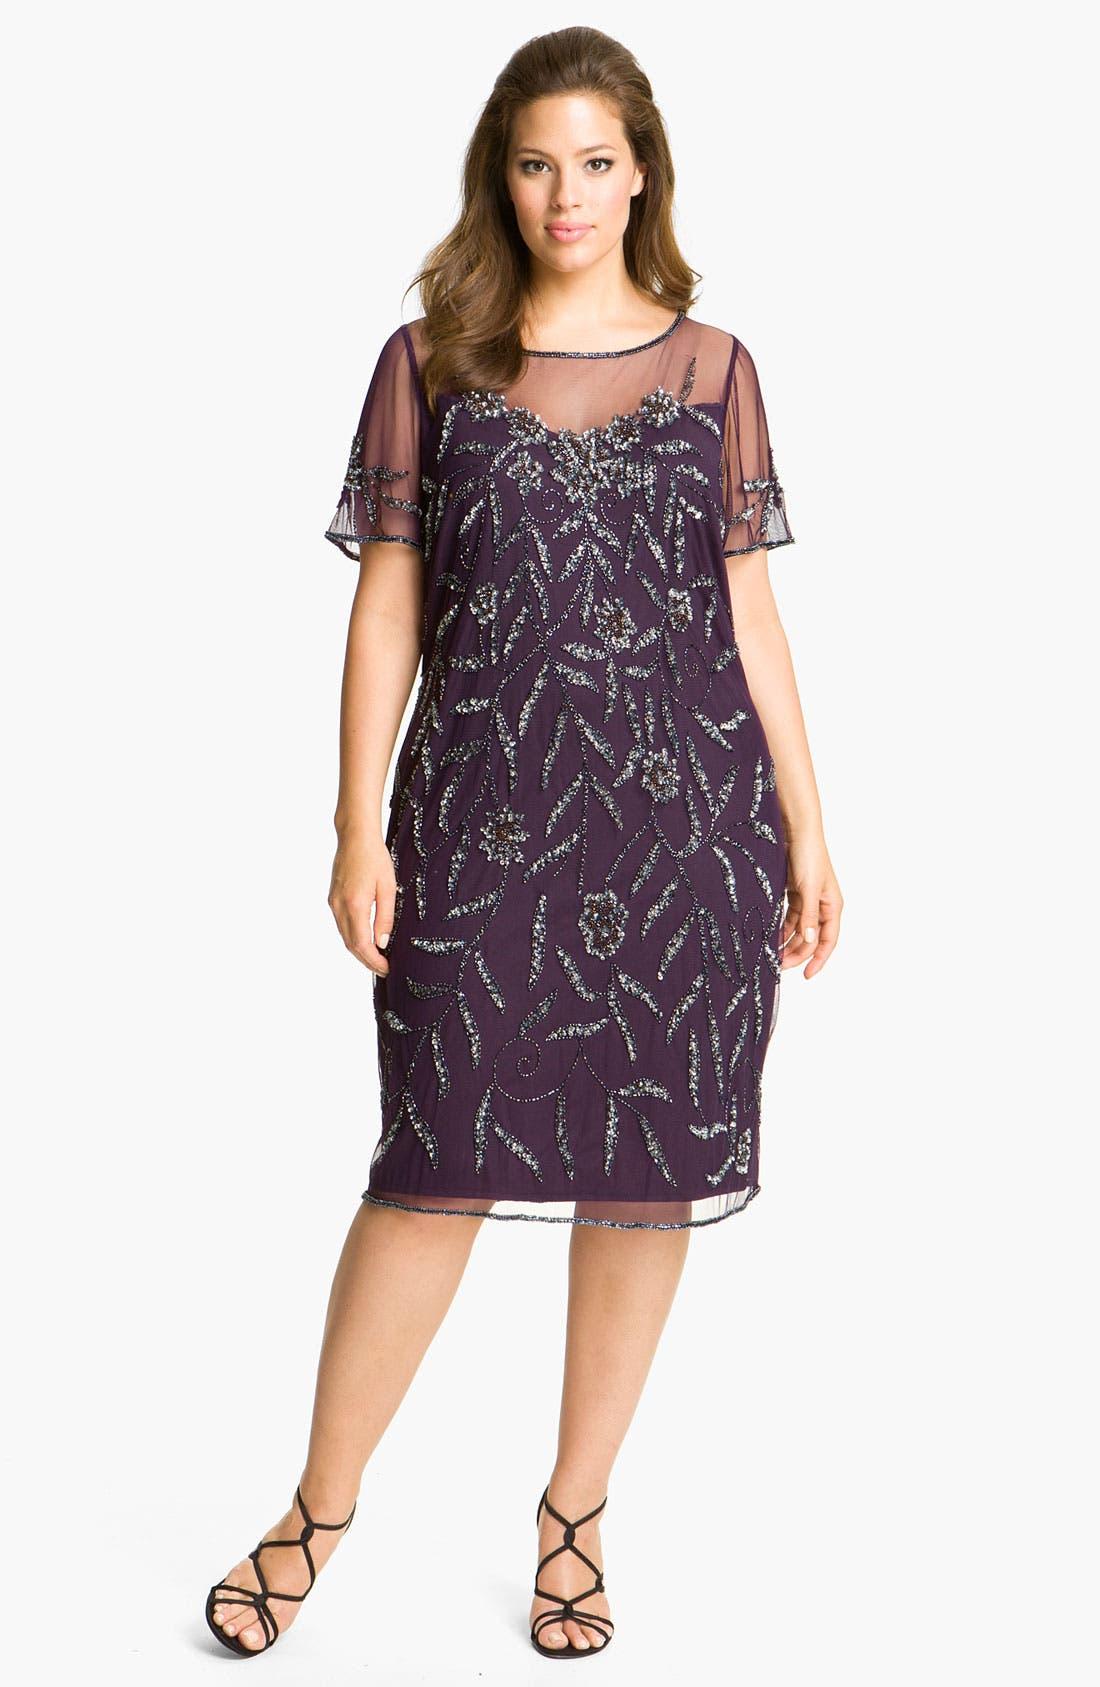 Alternate Image 1 Selected - Pisarro Nights Beaded Illusion Dress (Plus)